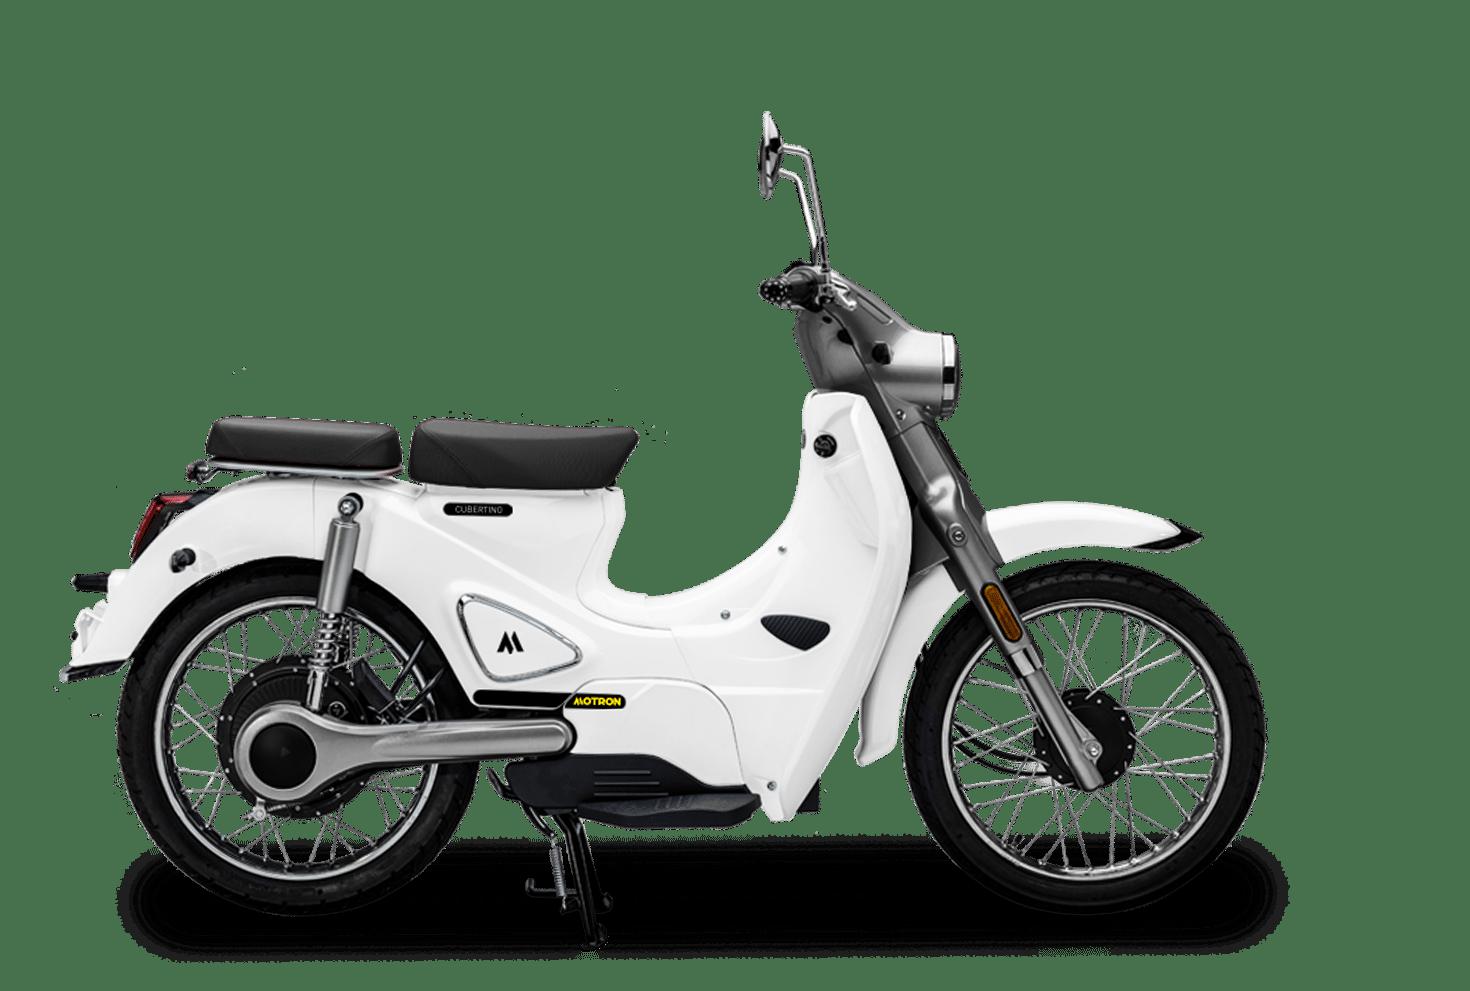 Motron Motorcycles - Cubertino